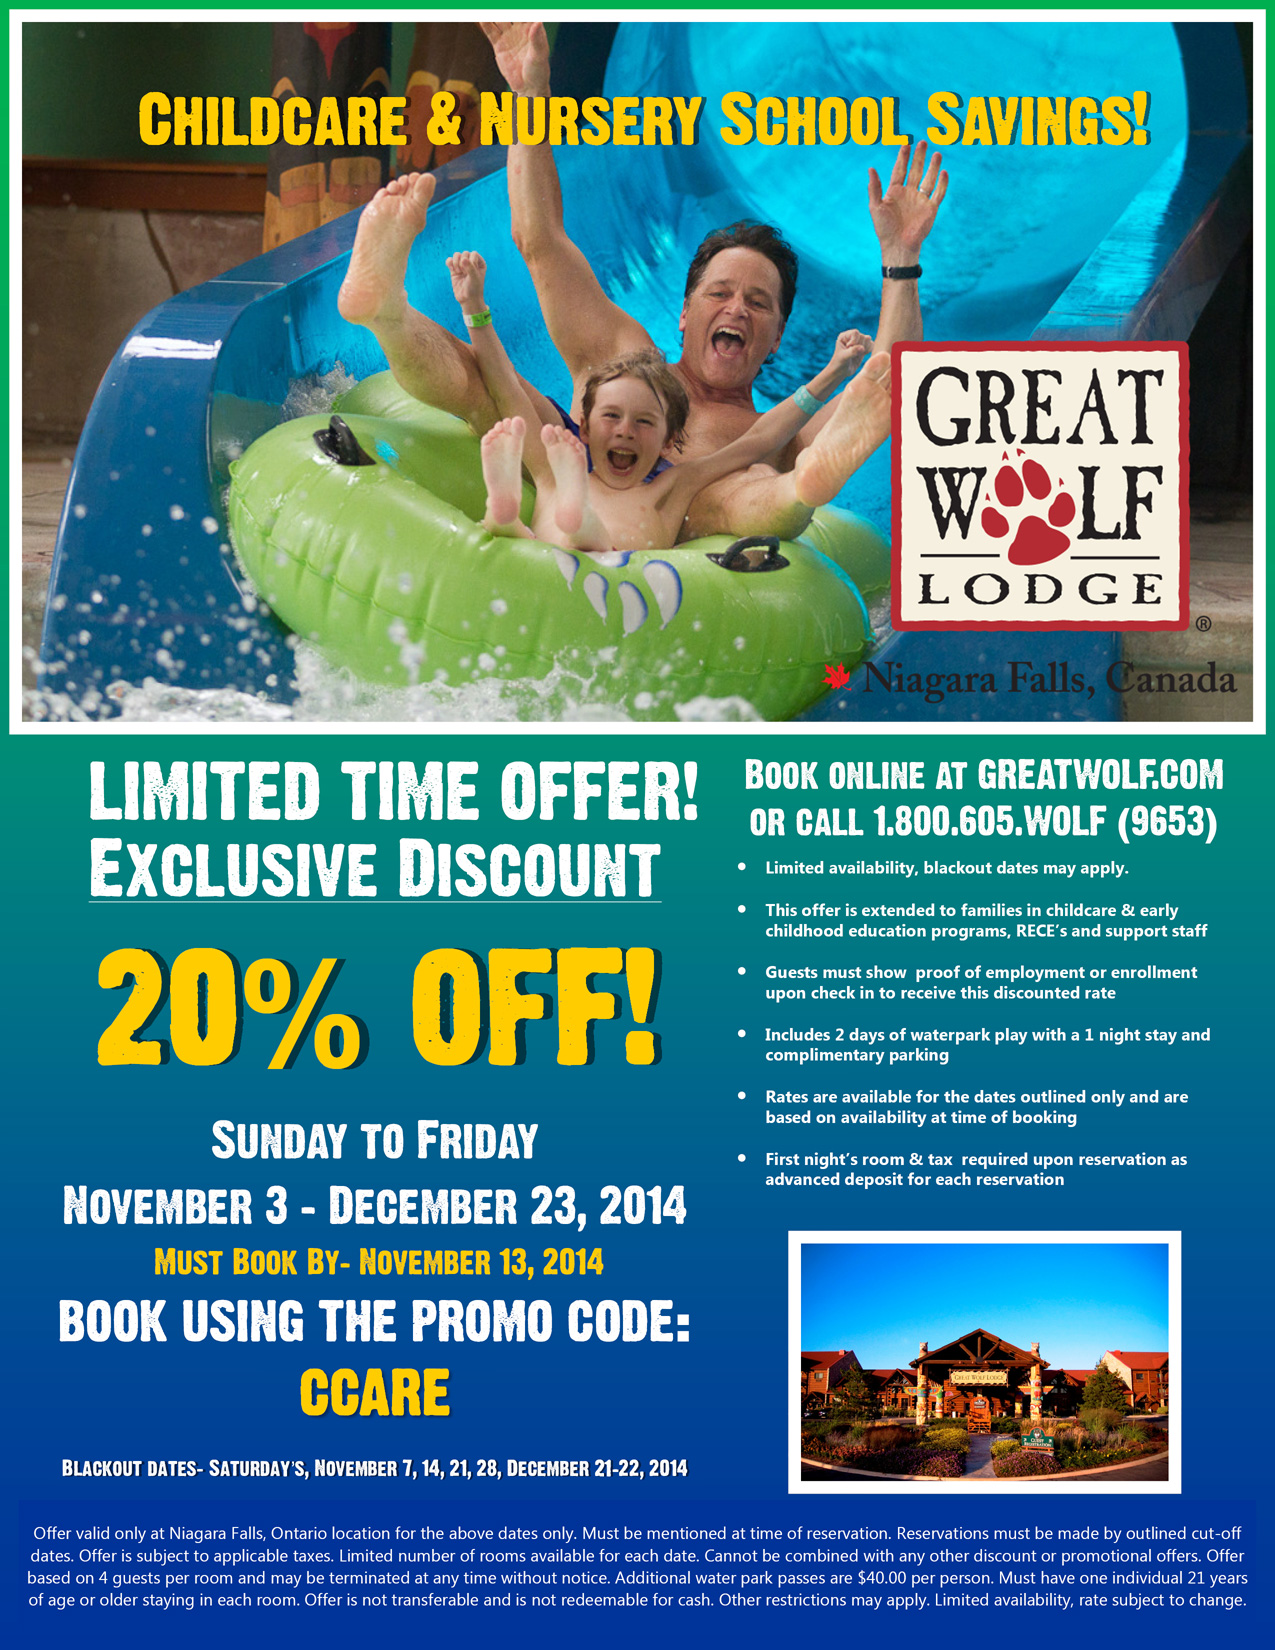 Great-Wolf-Lodge---Childcare-&-Nursery-School-Sale-(October,-2014)